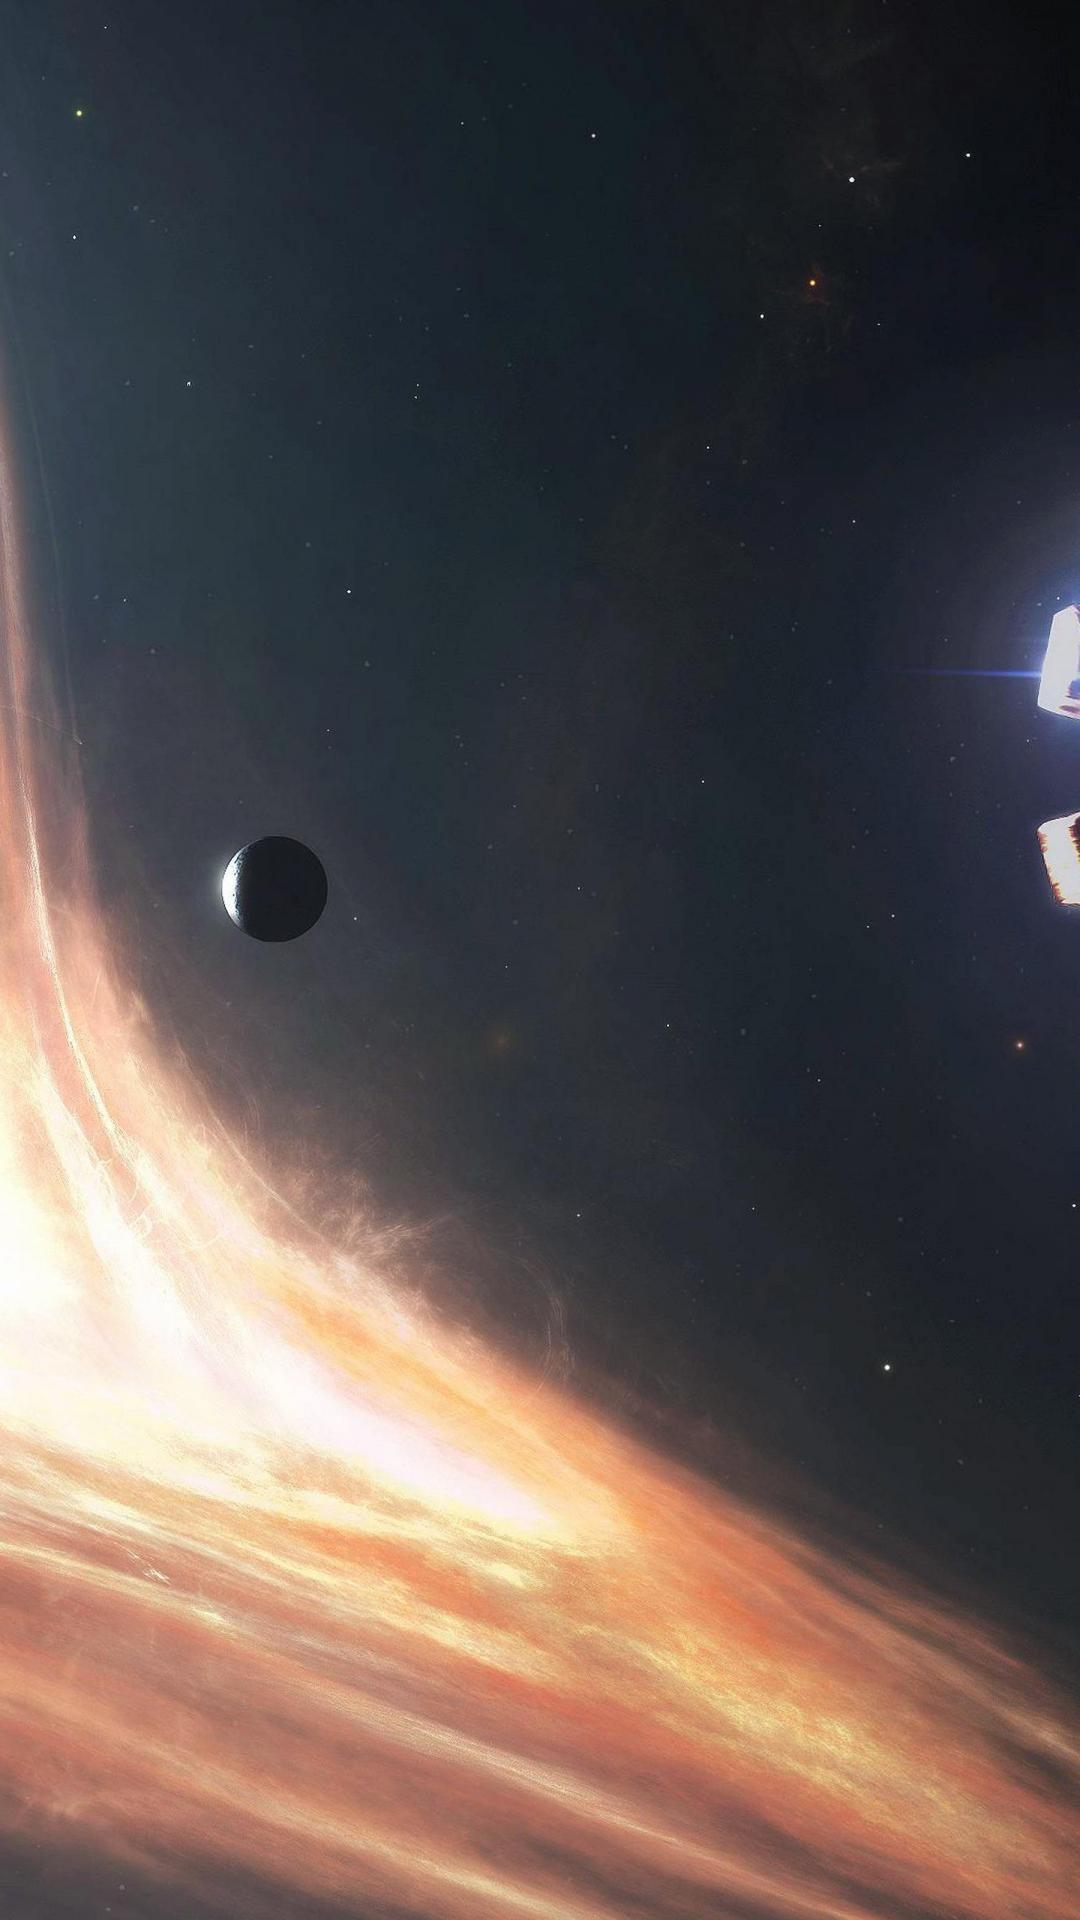 interstellar black hole iphone wallpaper …